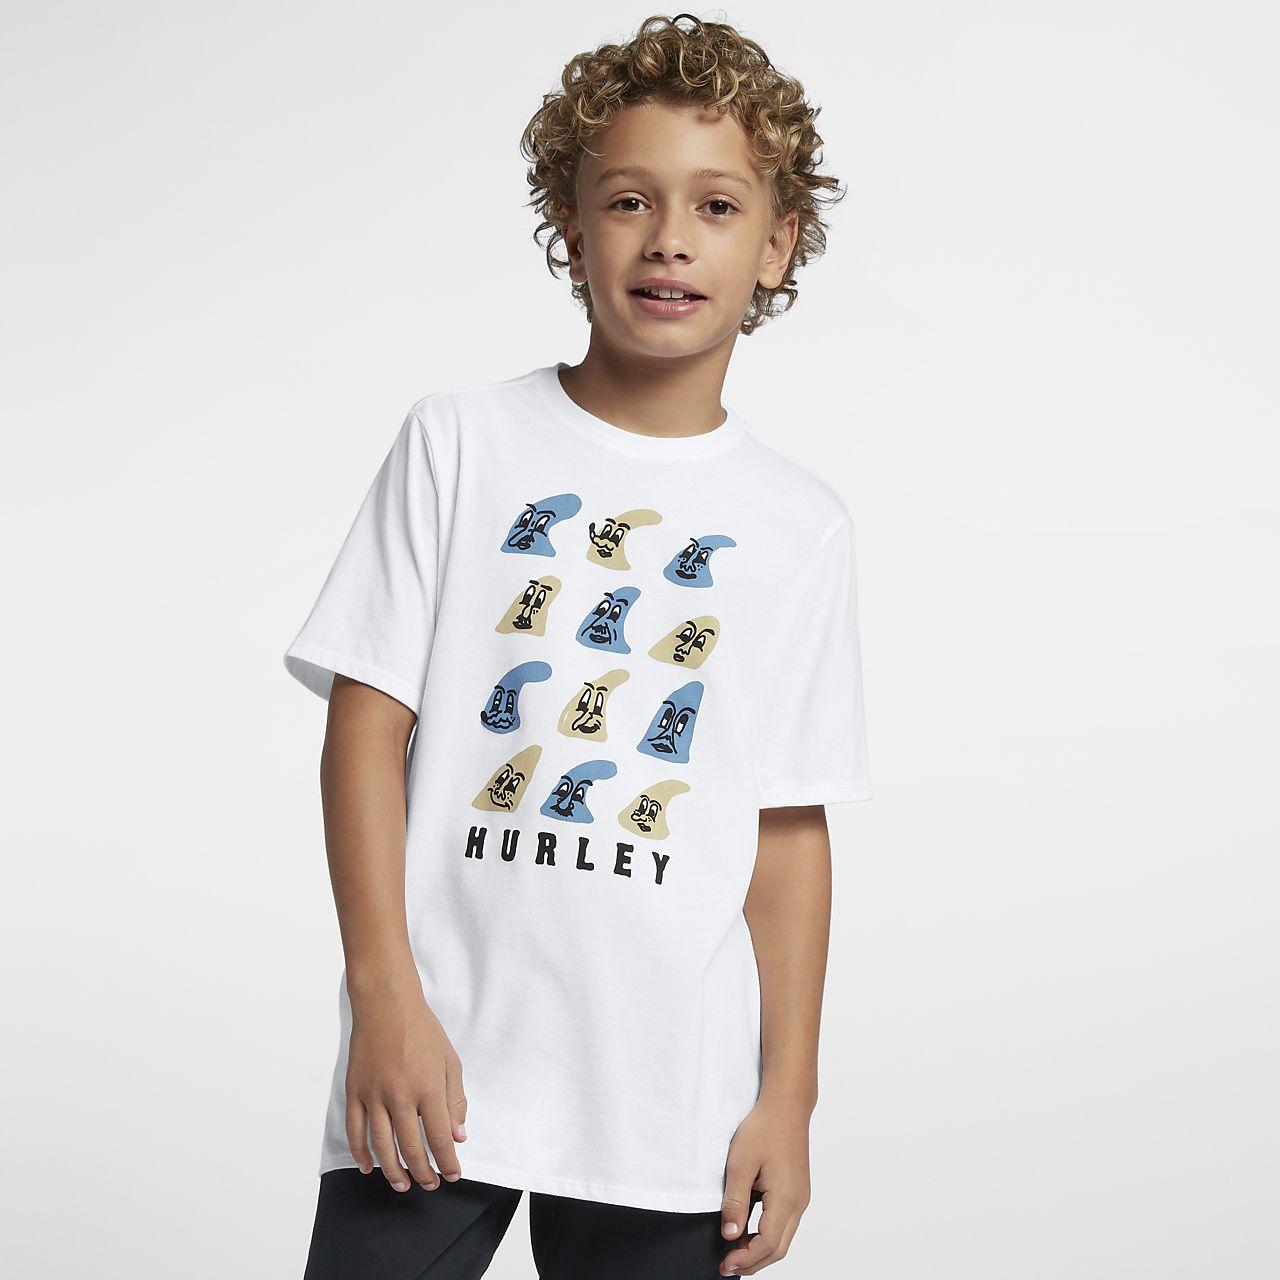 T-shirt Hurley Premium Fin Face - Bambino/Ragazzo